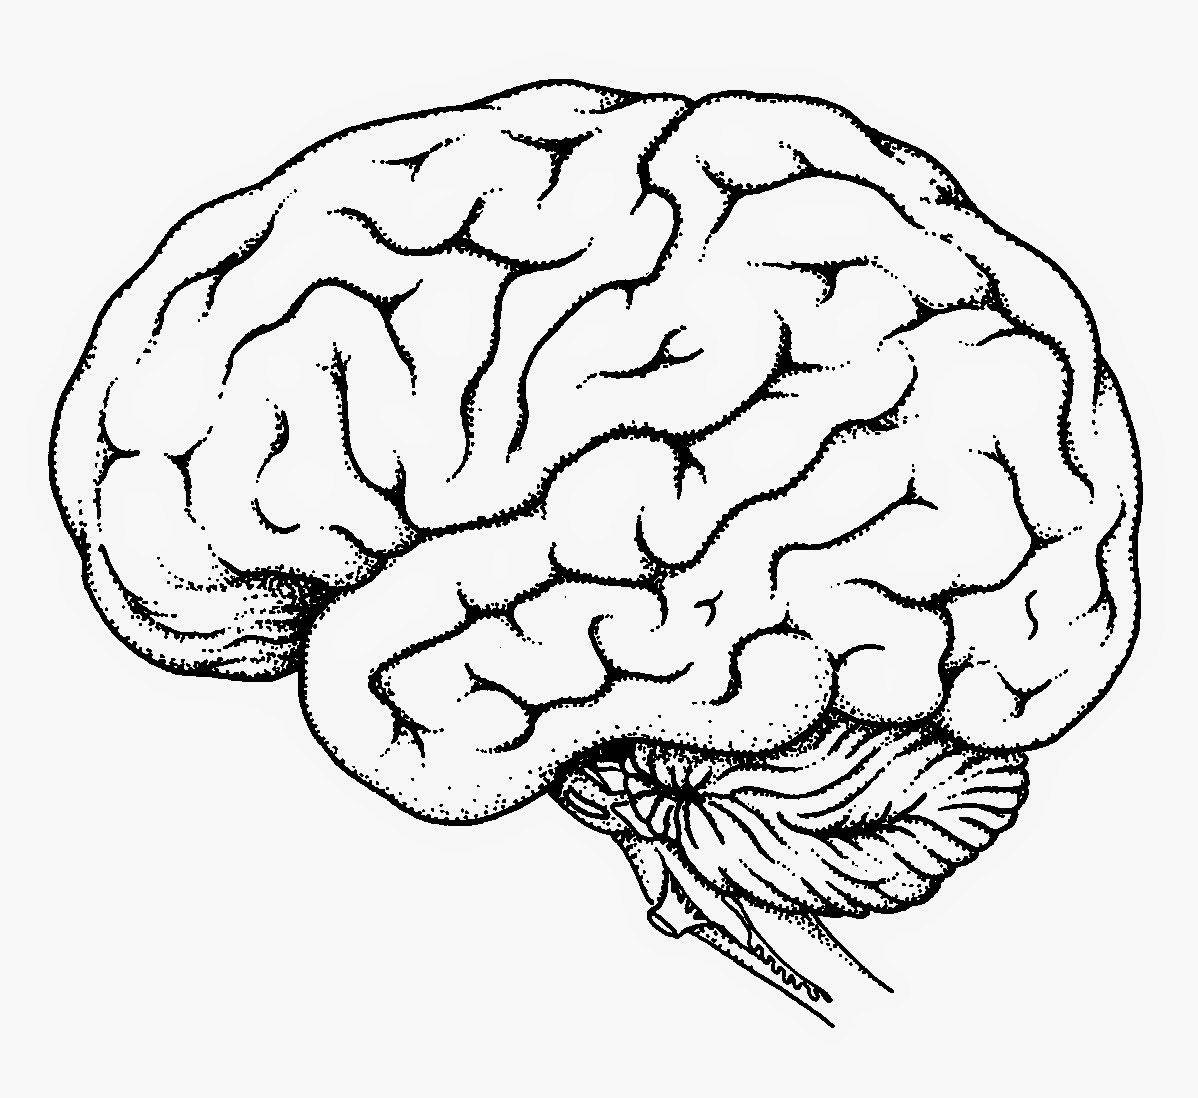 Printable Unlabeled Brain Diagram - Aflam-Neeeak